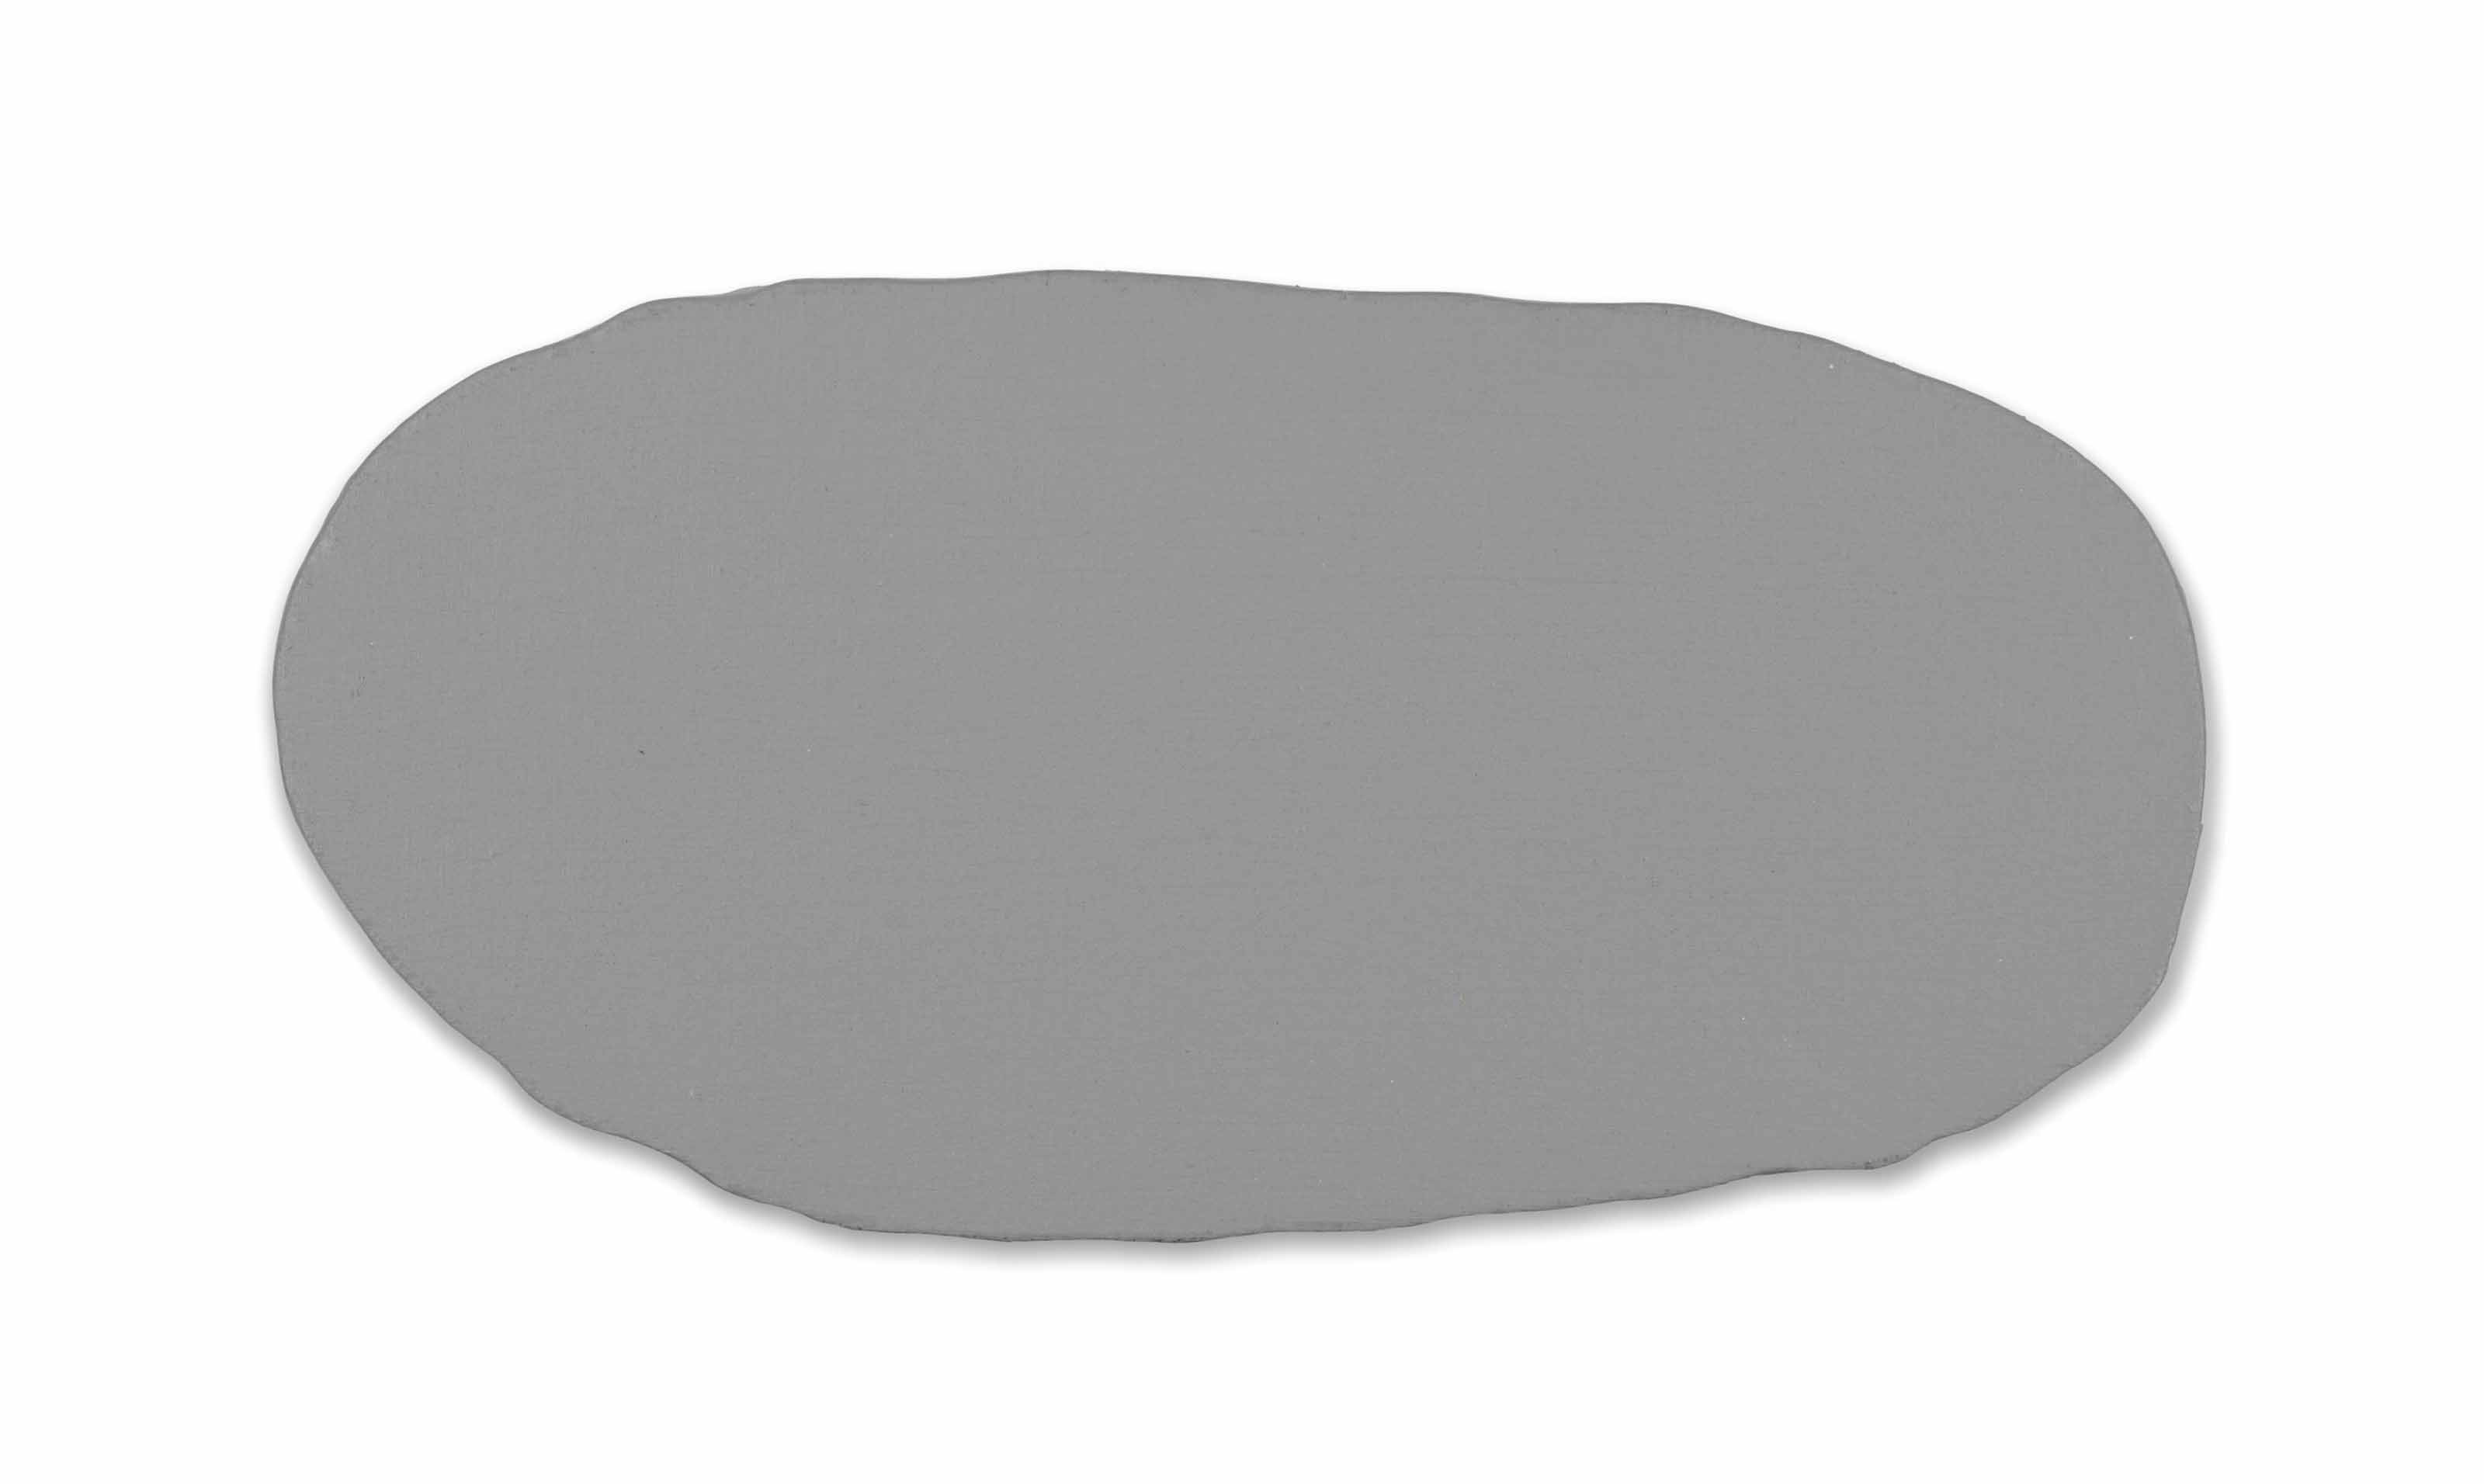 Graue Scheibe (Grey Disc)